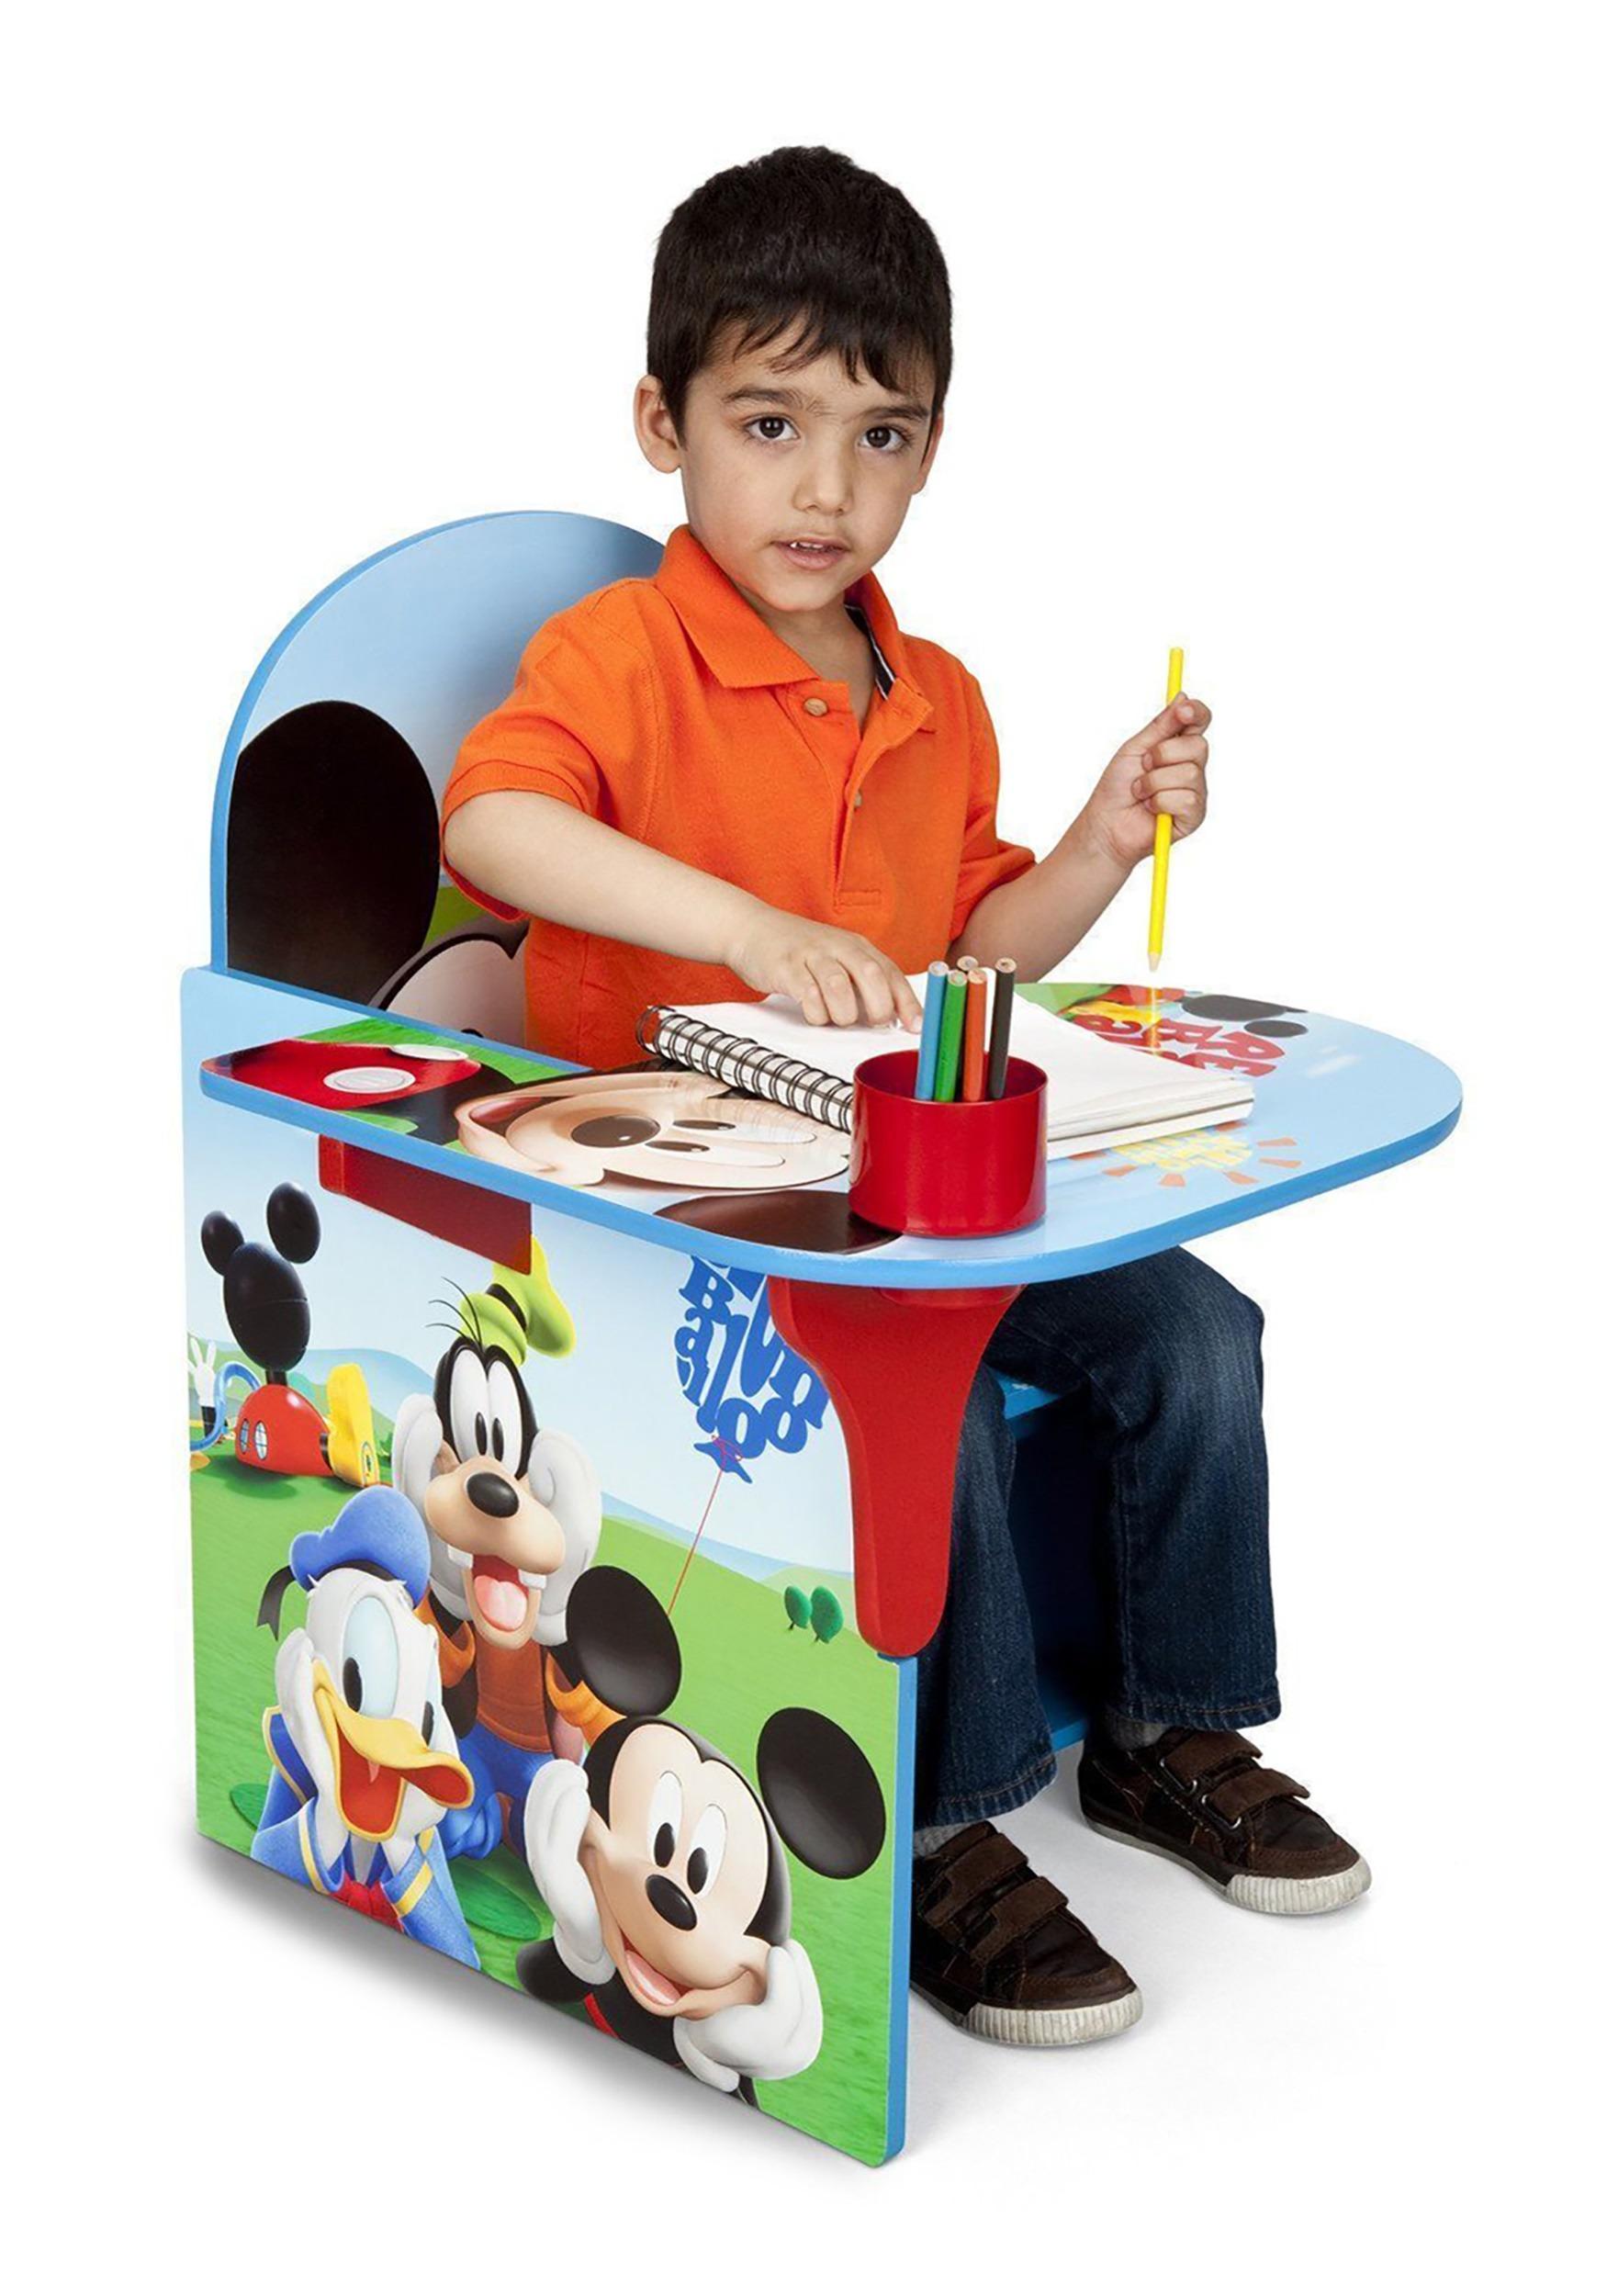 Mickey Mouse Chair Desk W Storage Bin